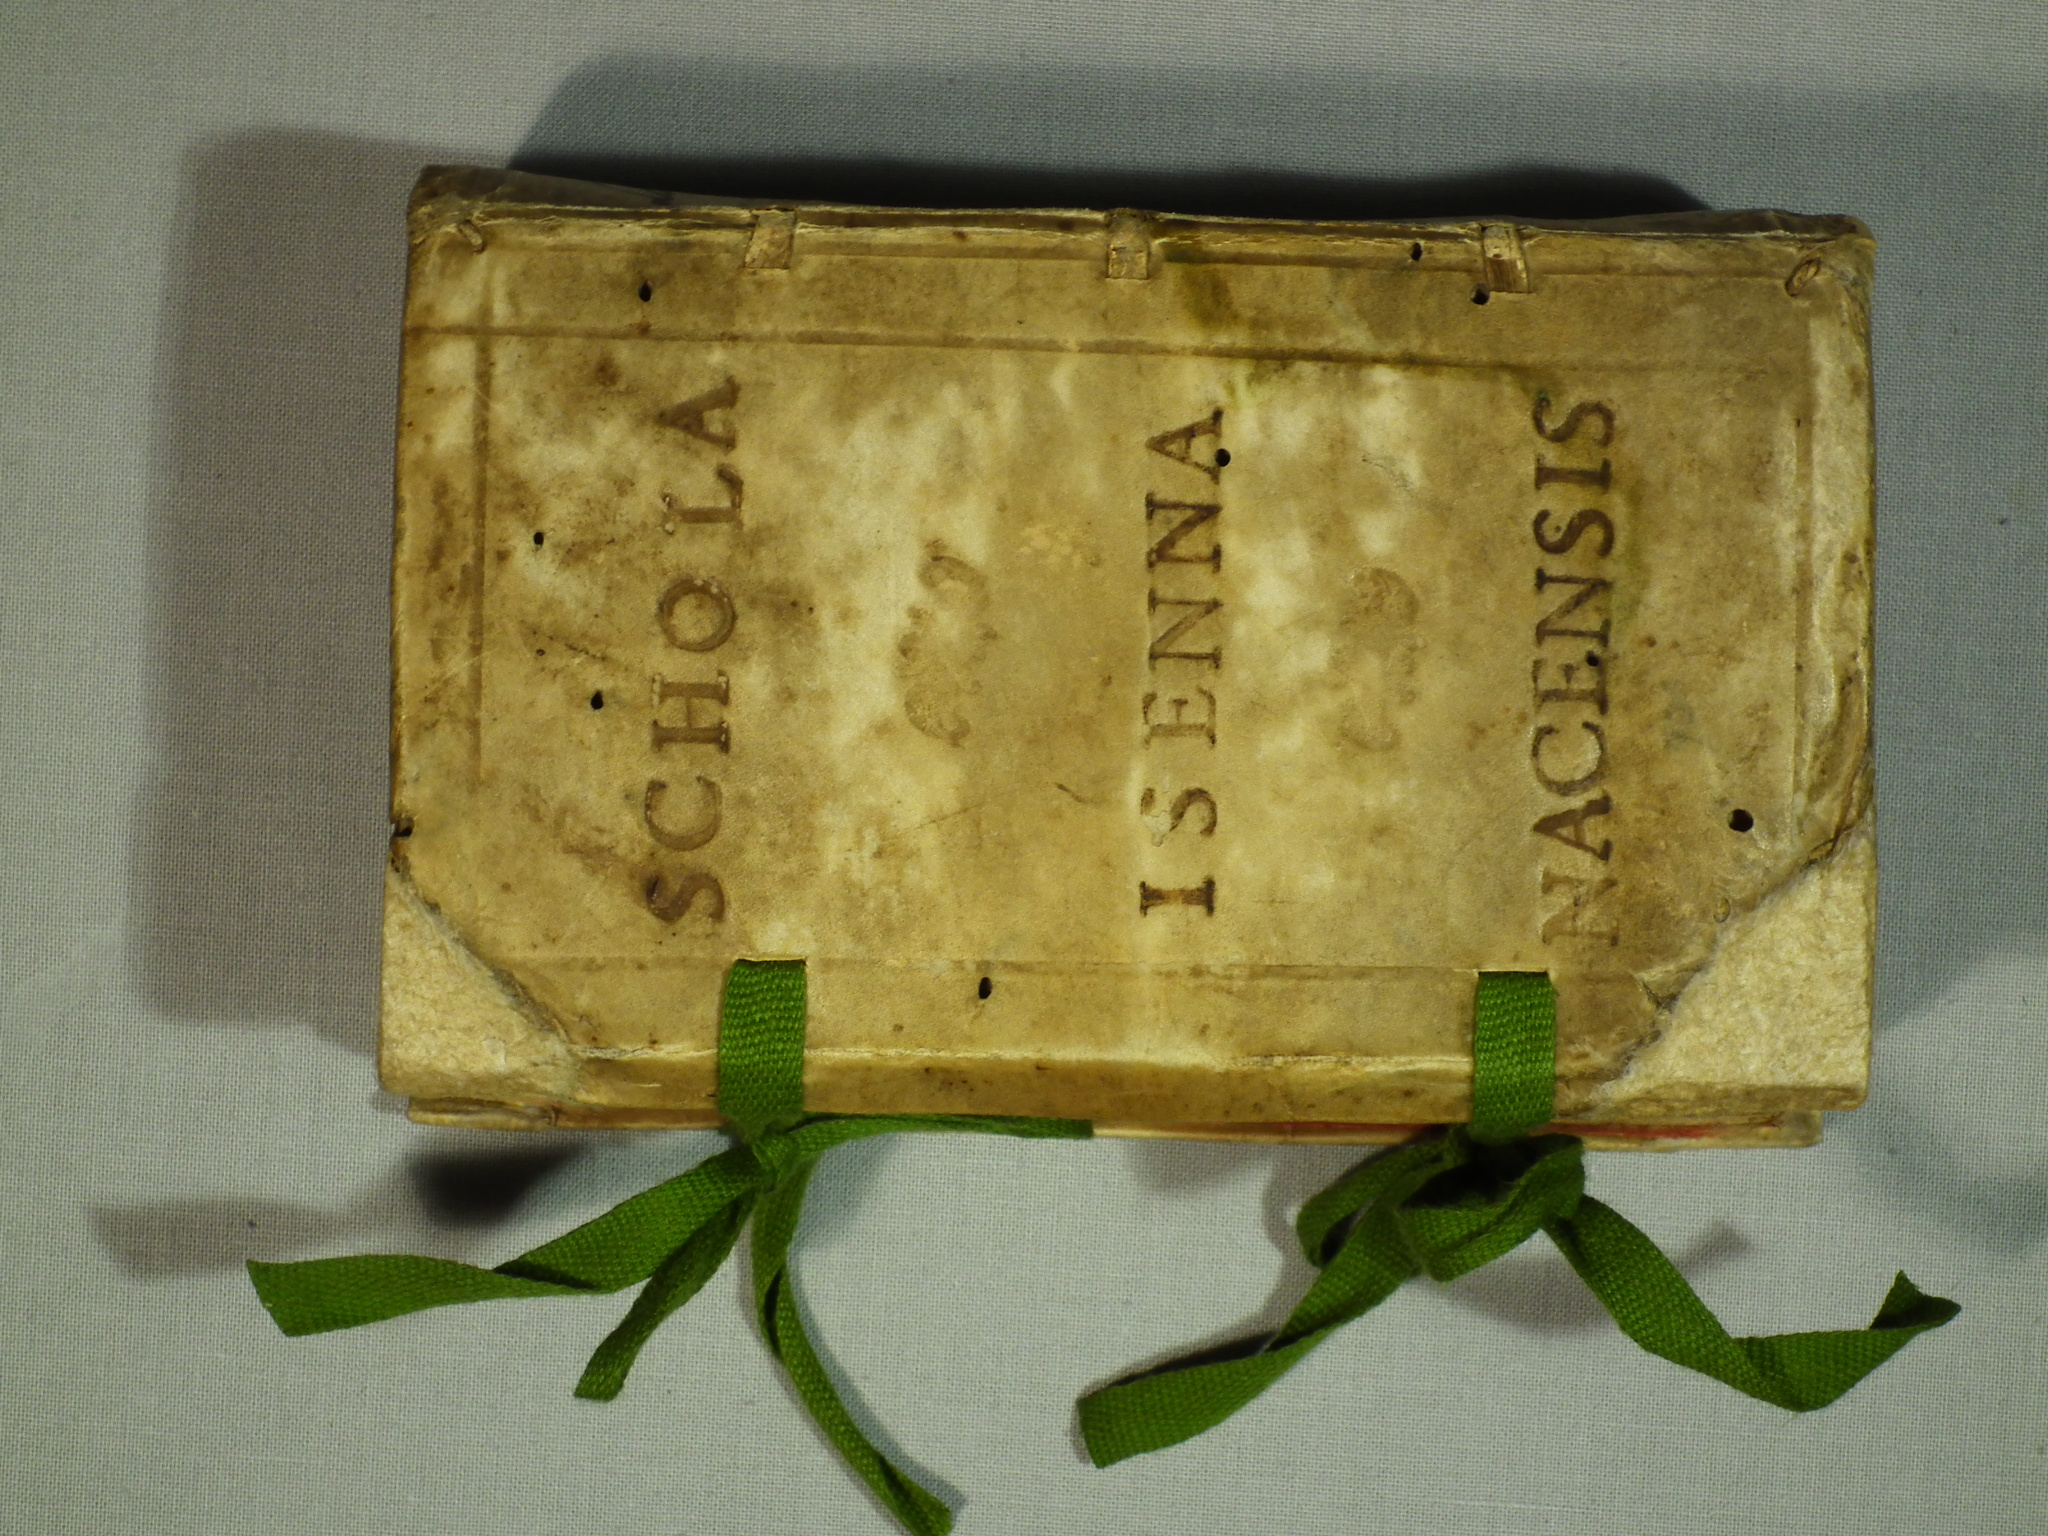 DISCANTI, Schola Isenna Nacensis, 1600. Nachzustand.